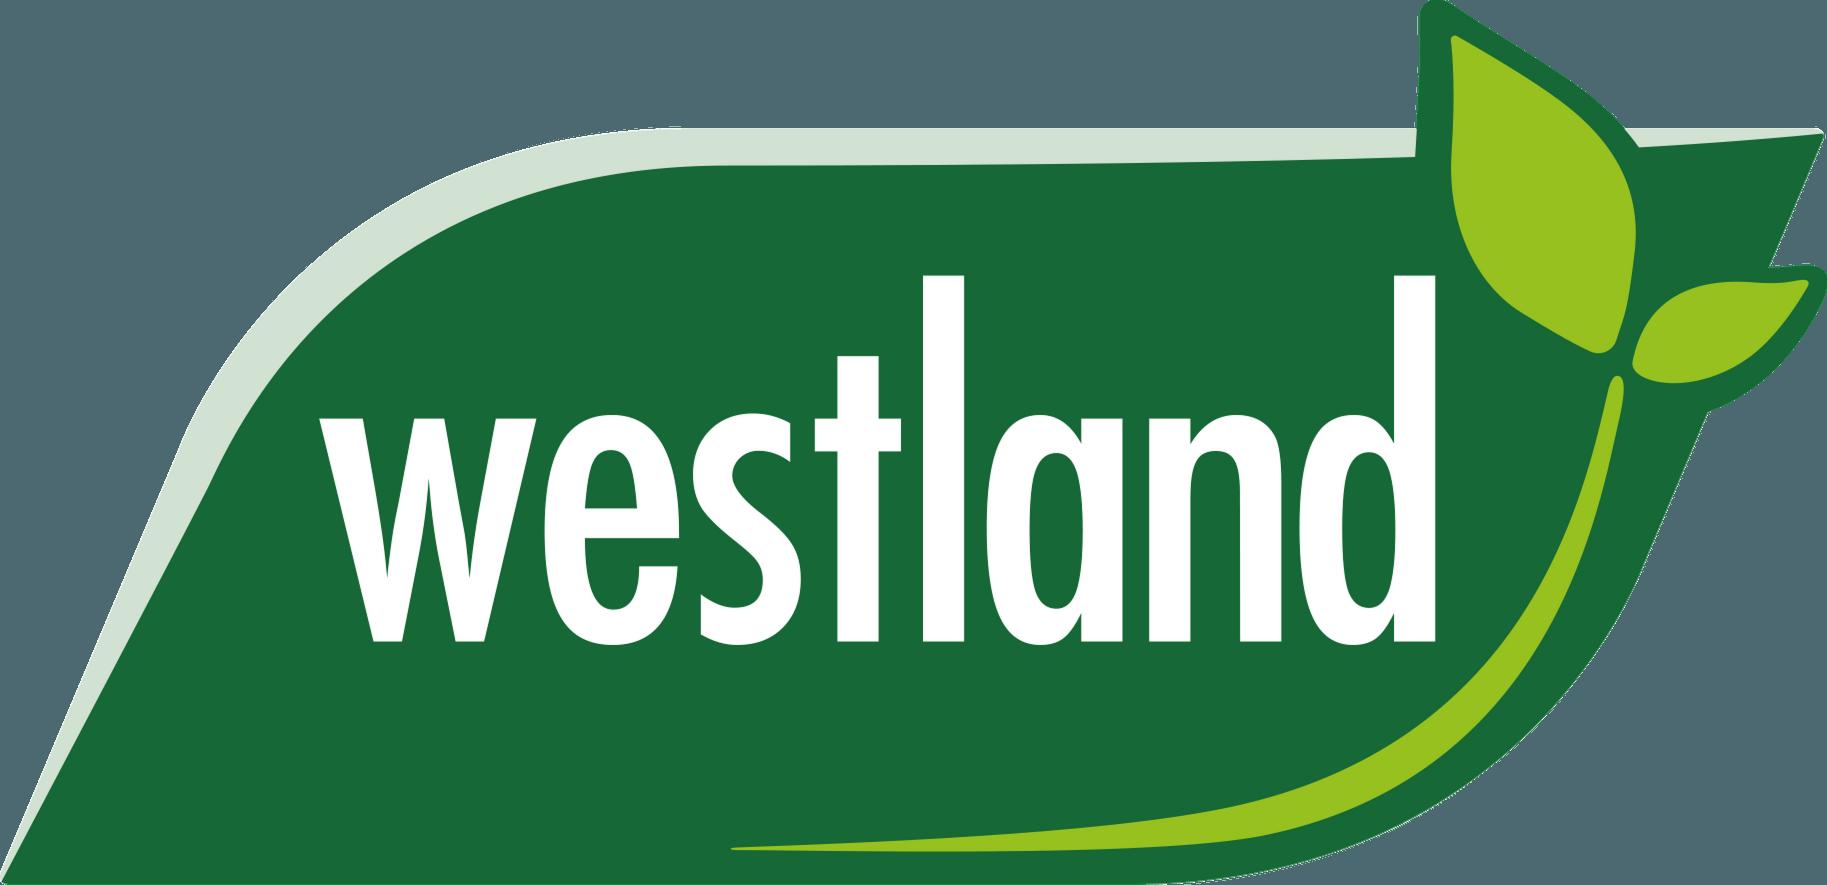 Westland Group - Glee Birmingham 2019 - The UK's most valuable